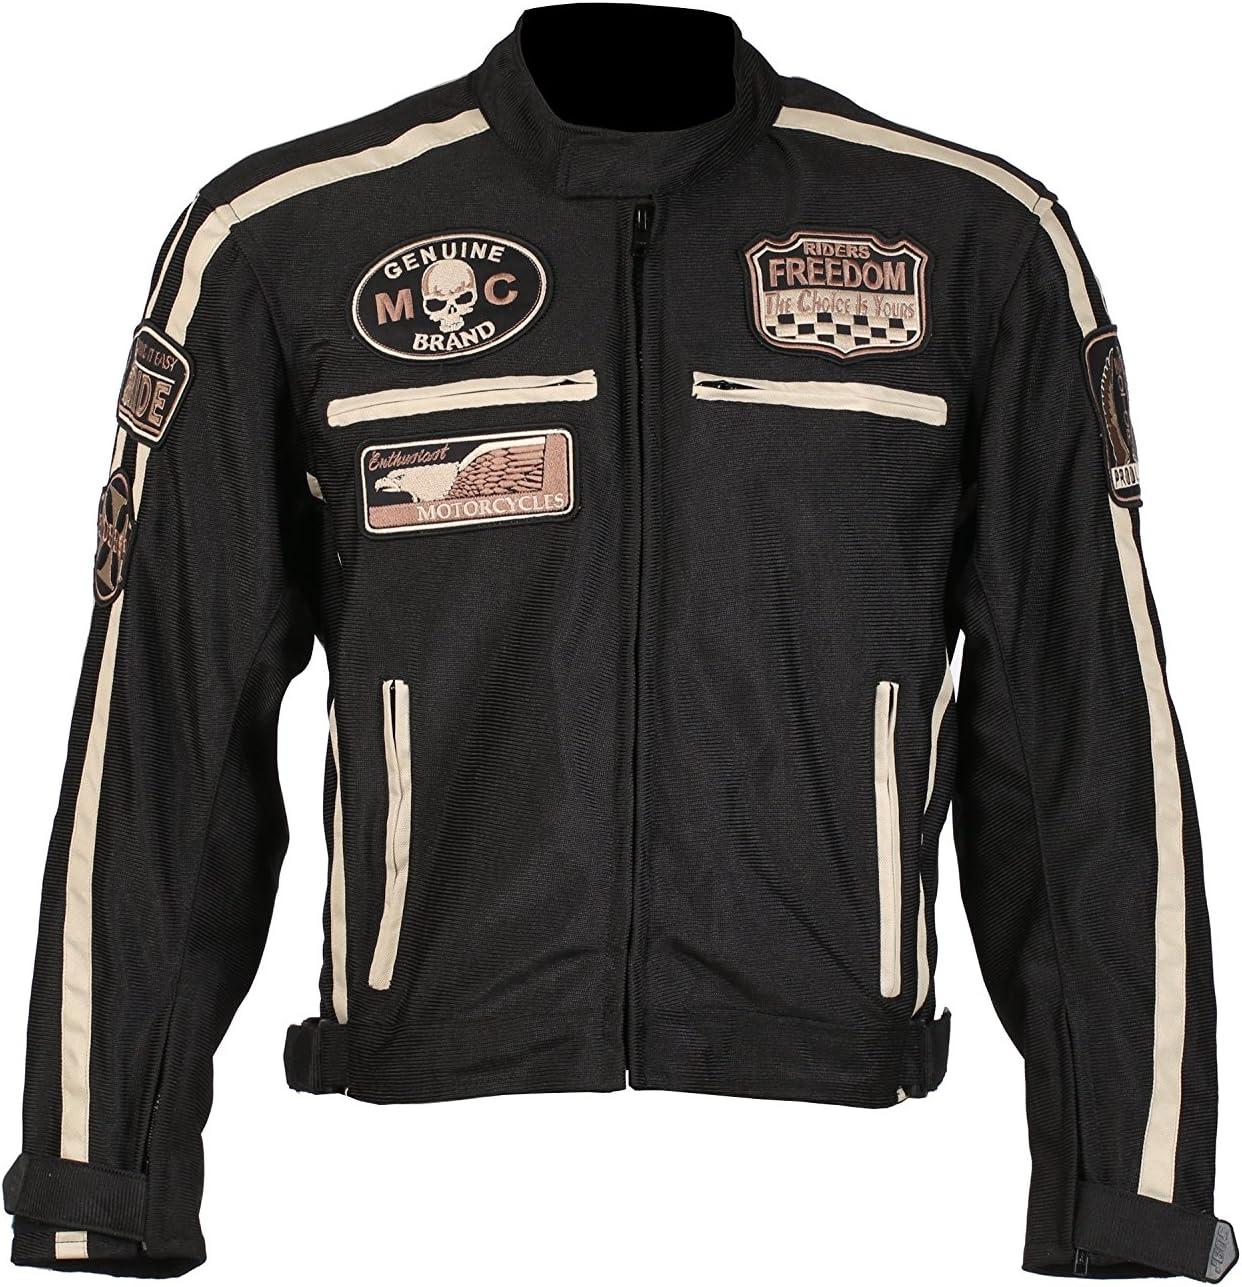 3XL BOS Motorrad Jacke sommer Gr schwarz